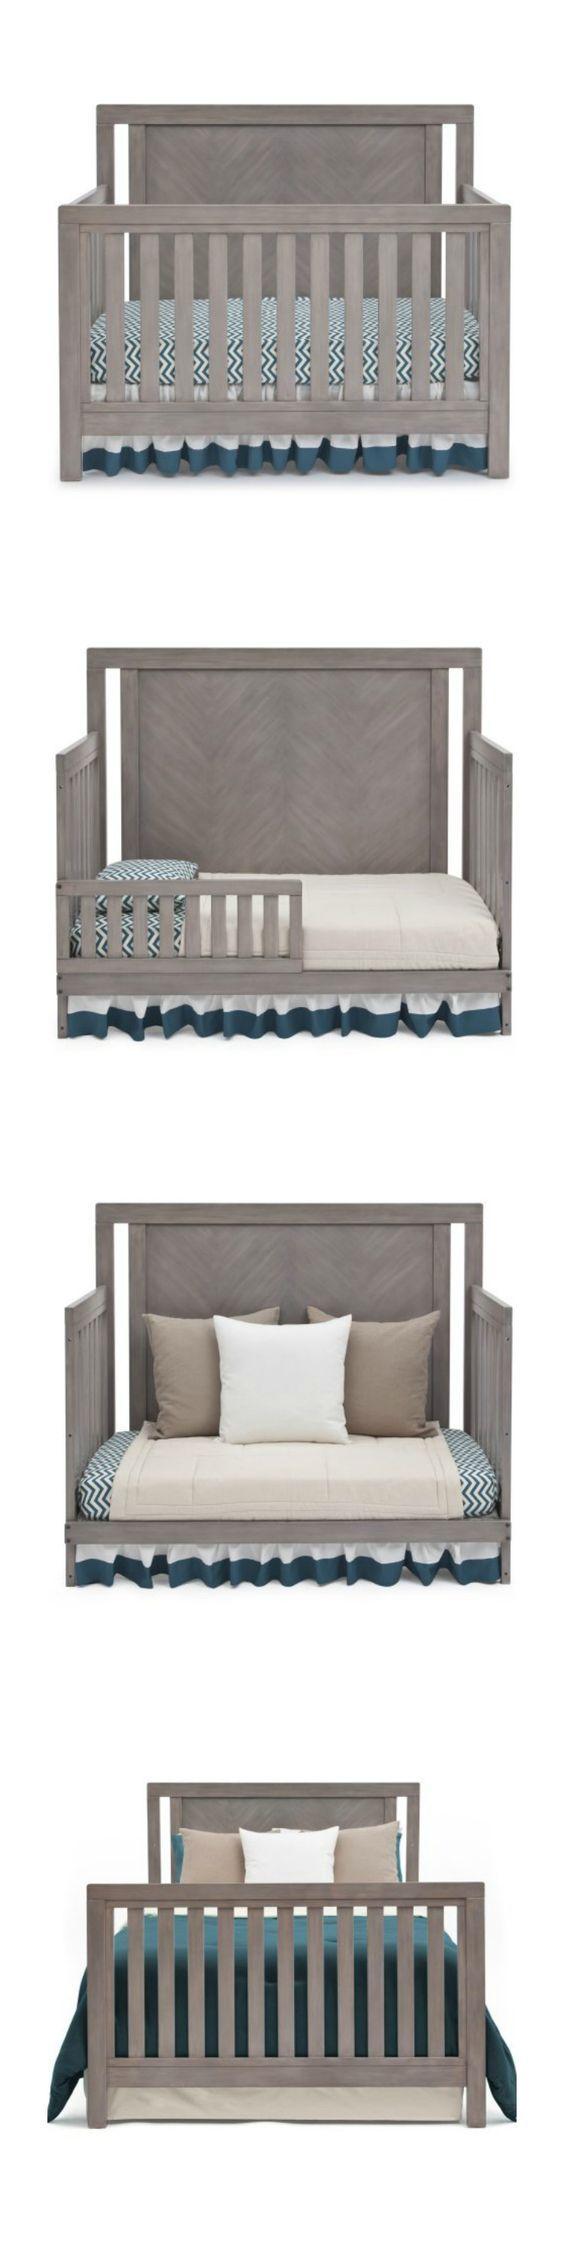 4-in-1 Convertible Crib.